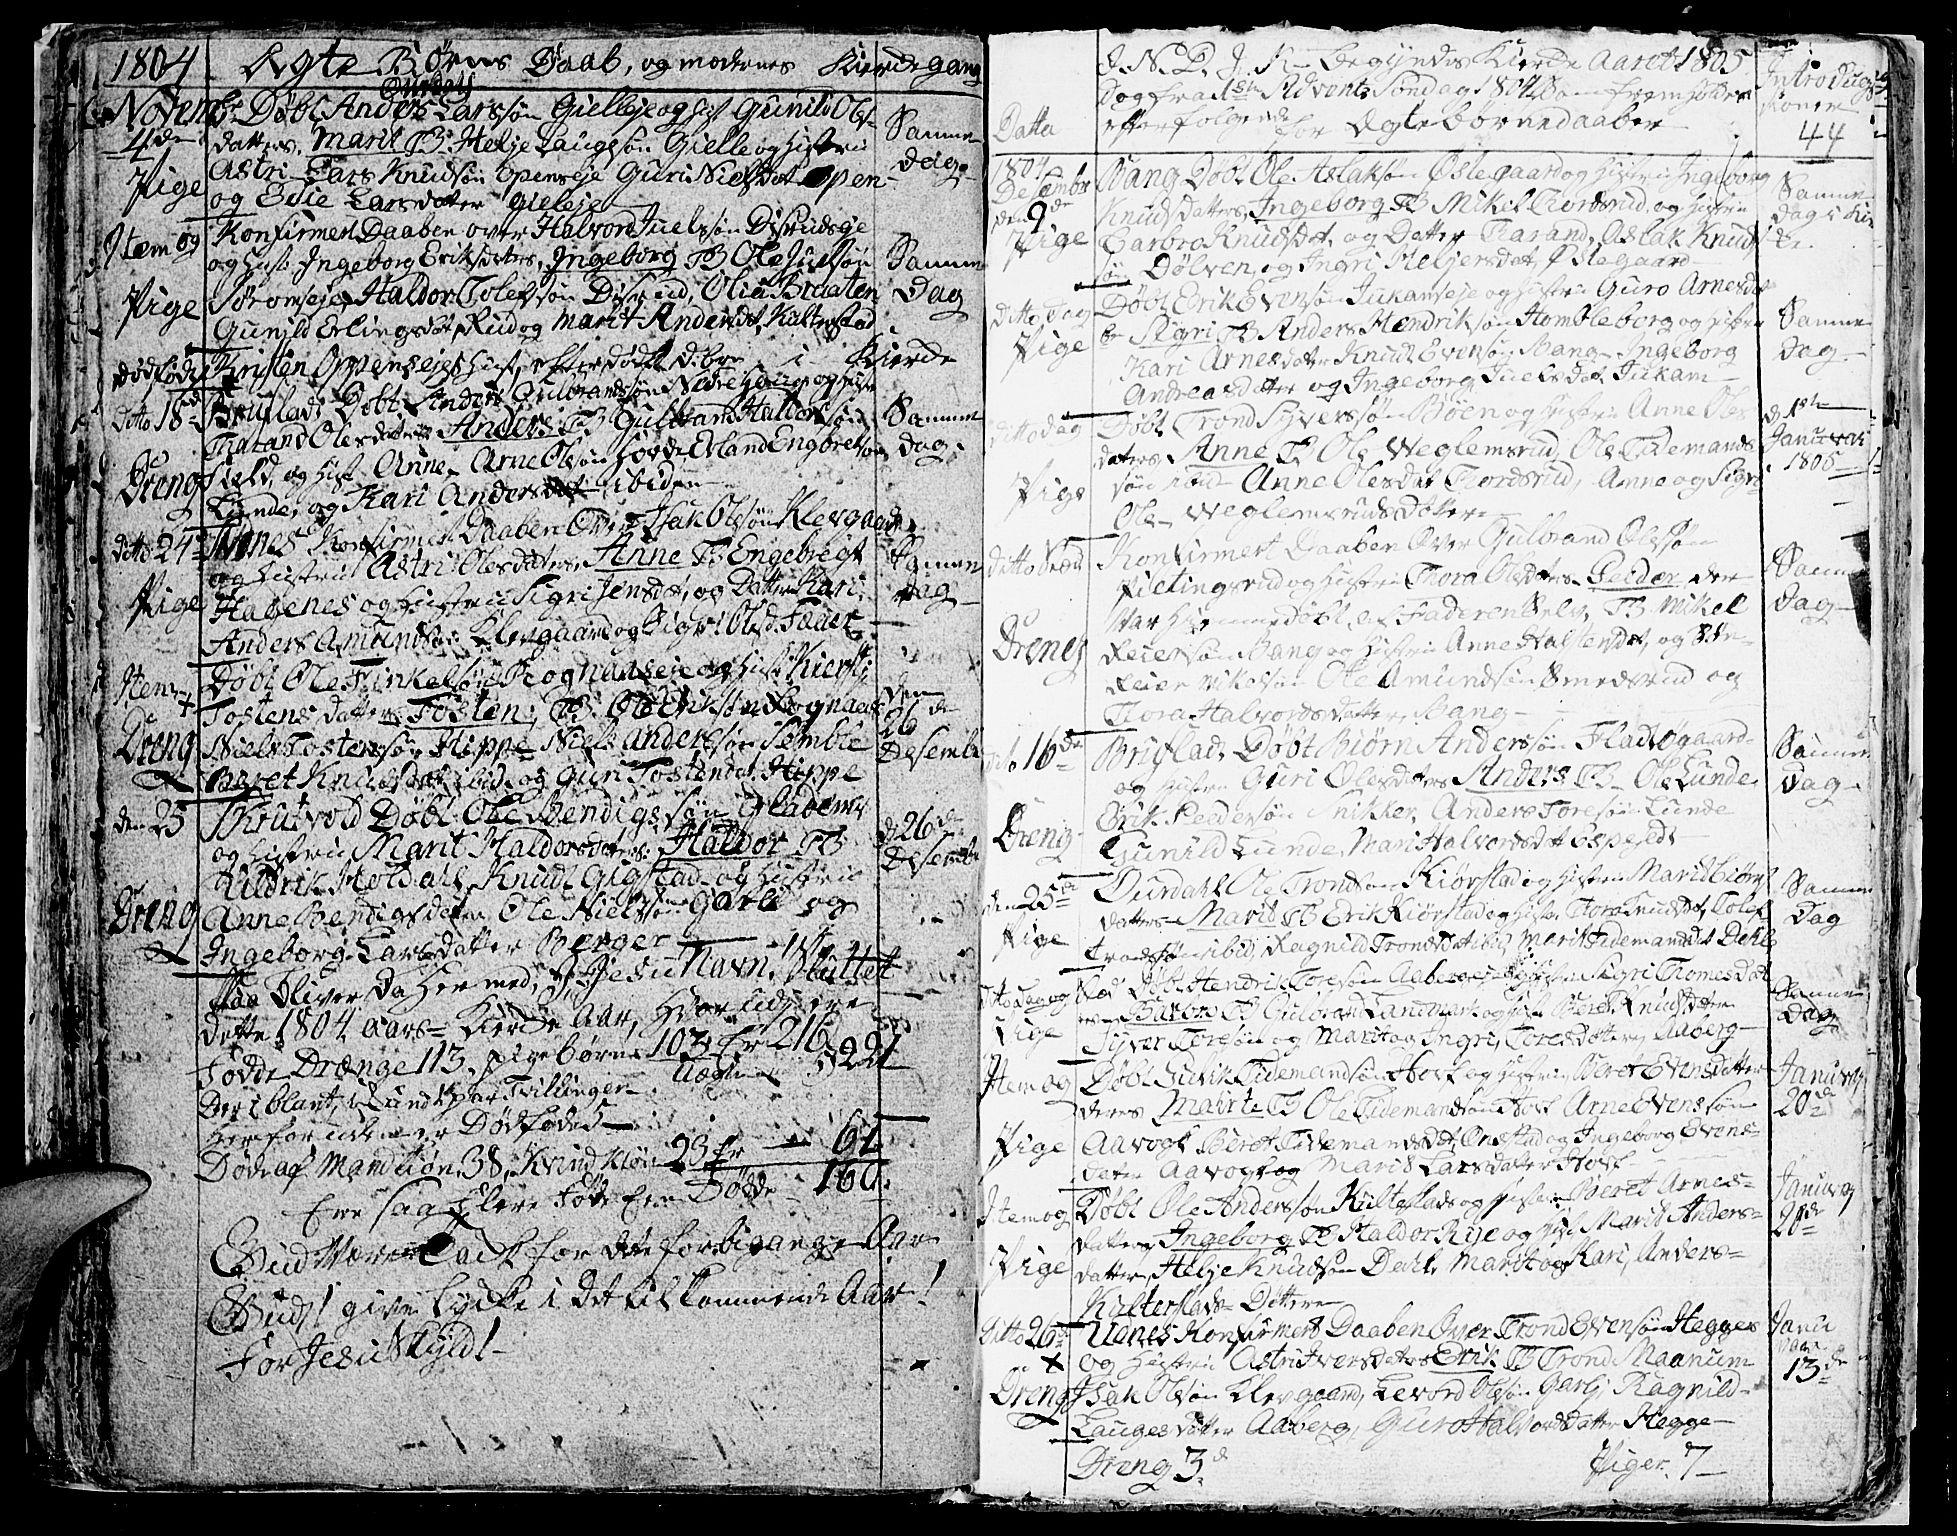 SAH, Aurdal prestekontor, Ministerialbok nr. 7, 1800-1808, s. 44